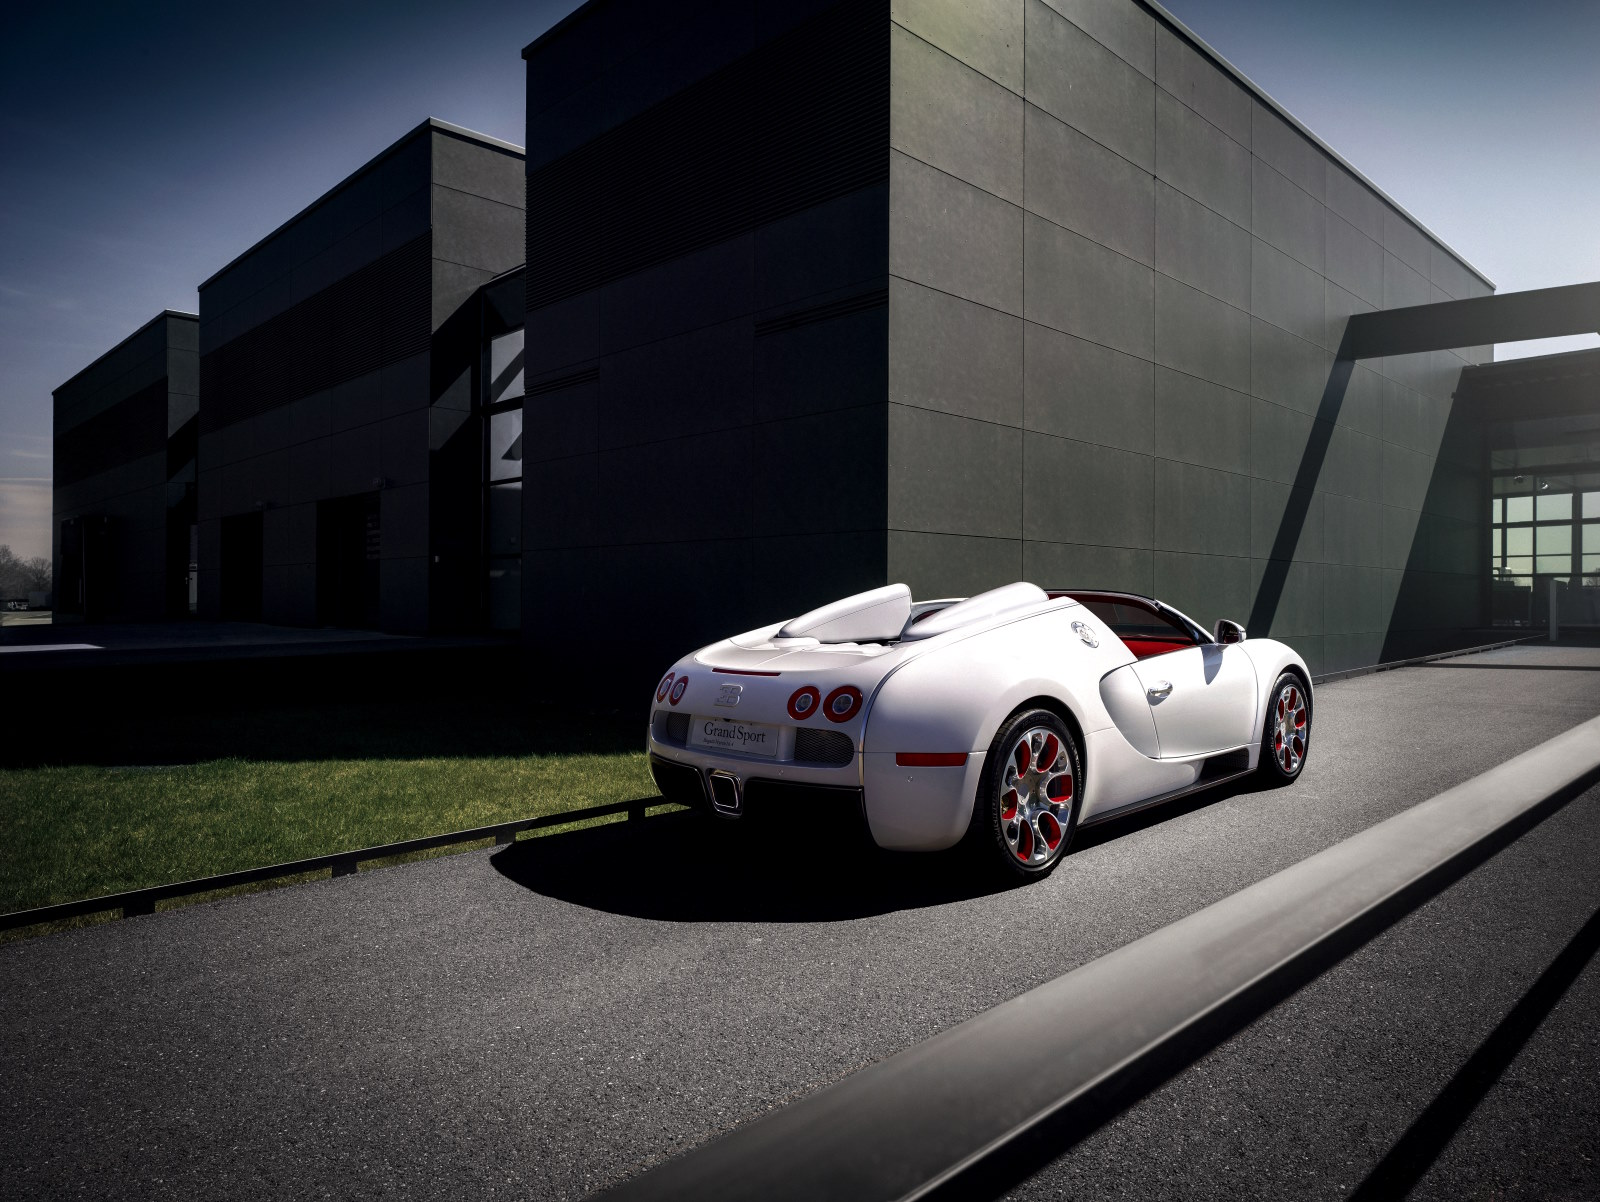 grand-sport-weilong03-1335290329 Remarkable Bugatti Veyron Grand Sport Vitesse Informacion Cars Trend